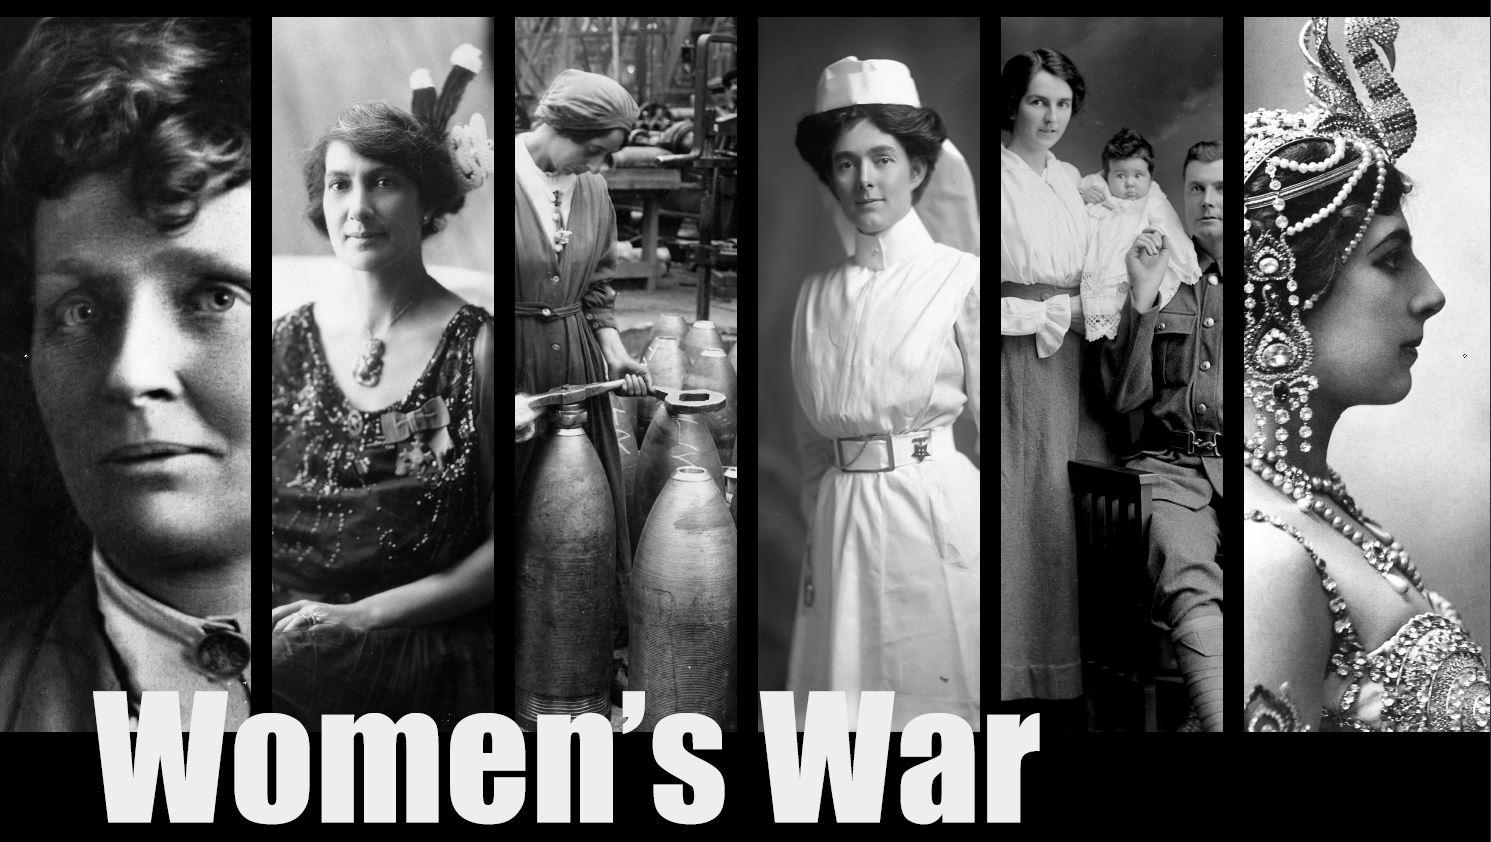 Womens_war_graphic.JPG